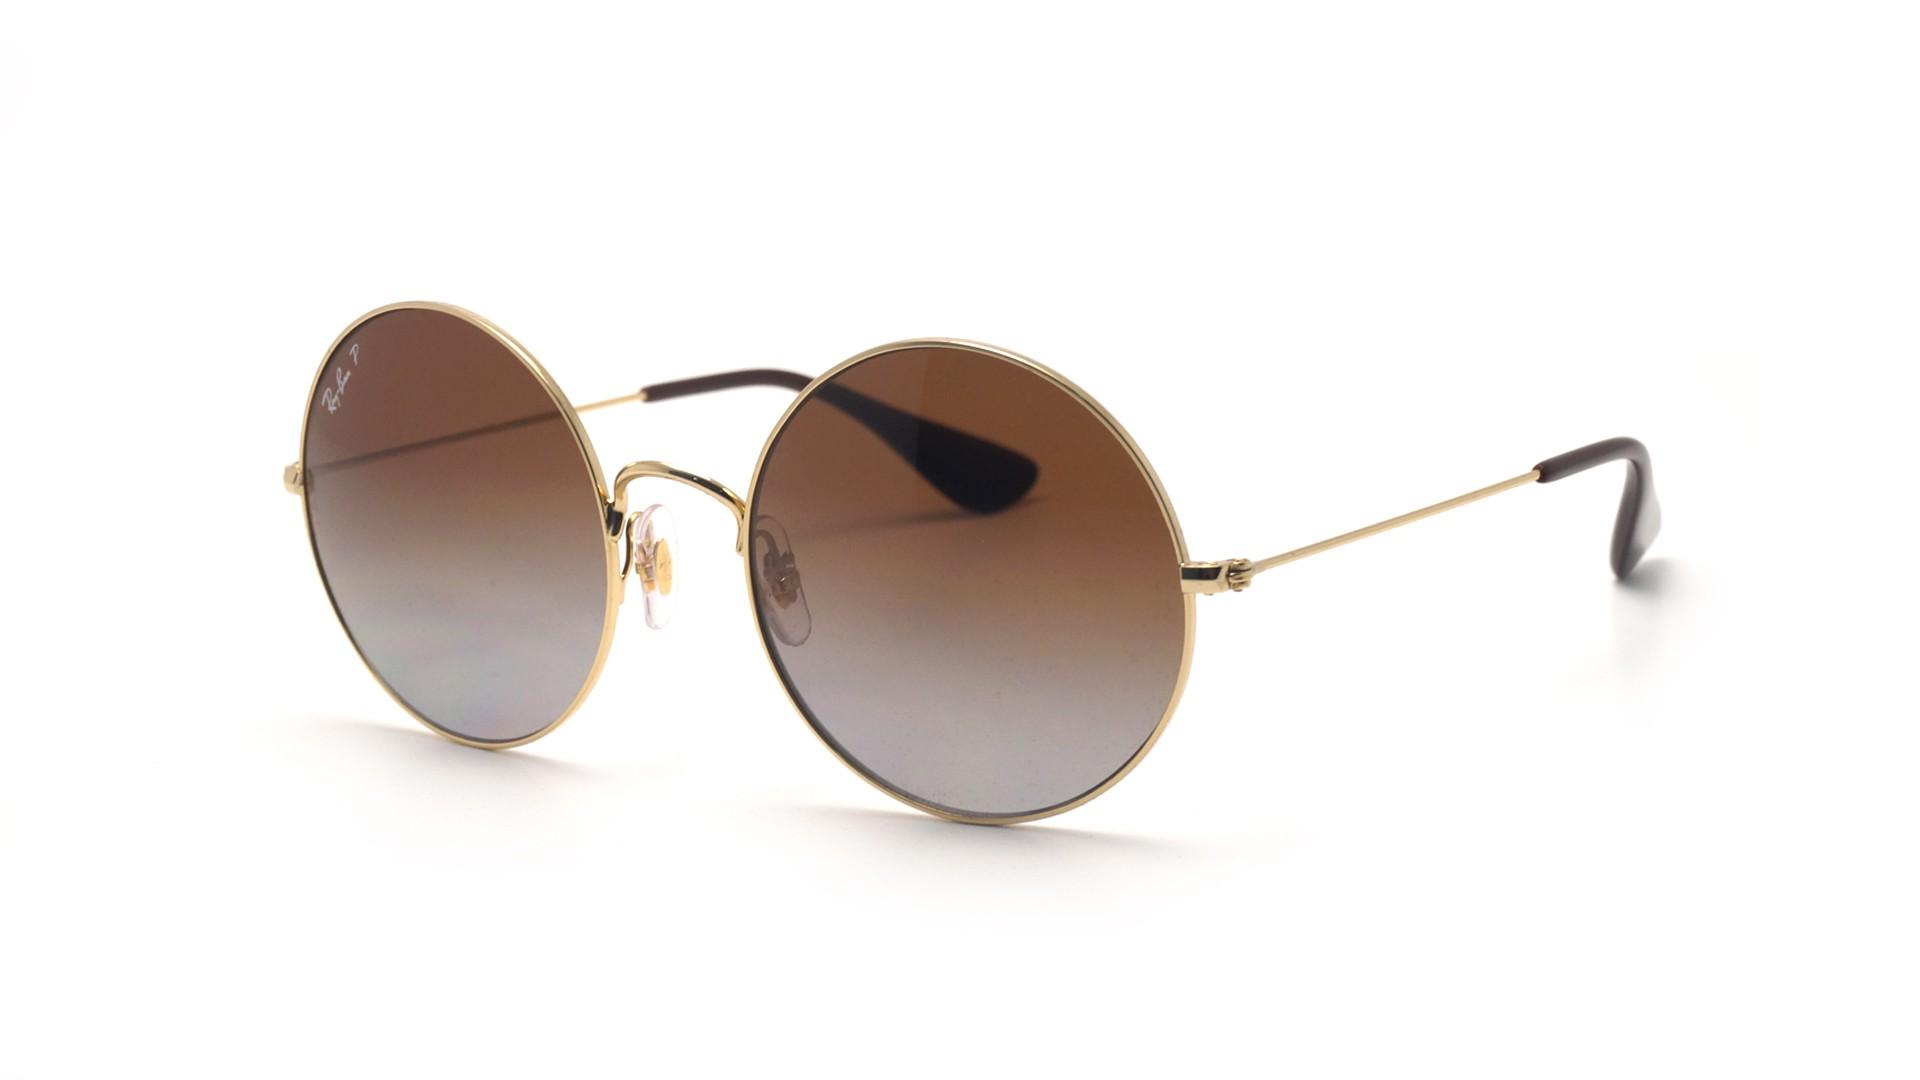 73ae1cb54a Sunglasses Ray-Ban Ja-jo Gold RB3592 001 T5 55-20 Large Polarized Gradient